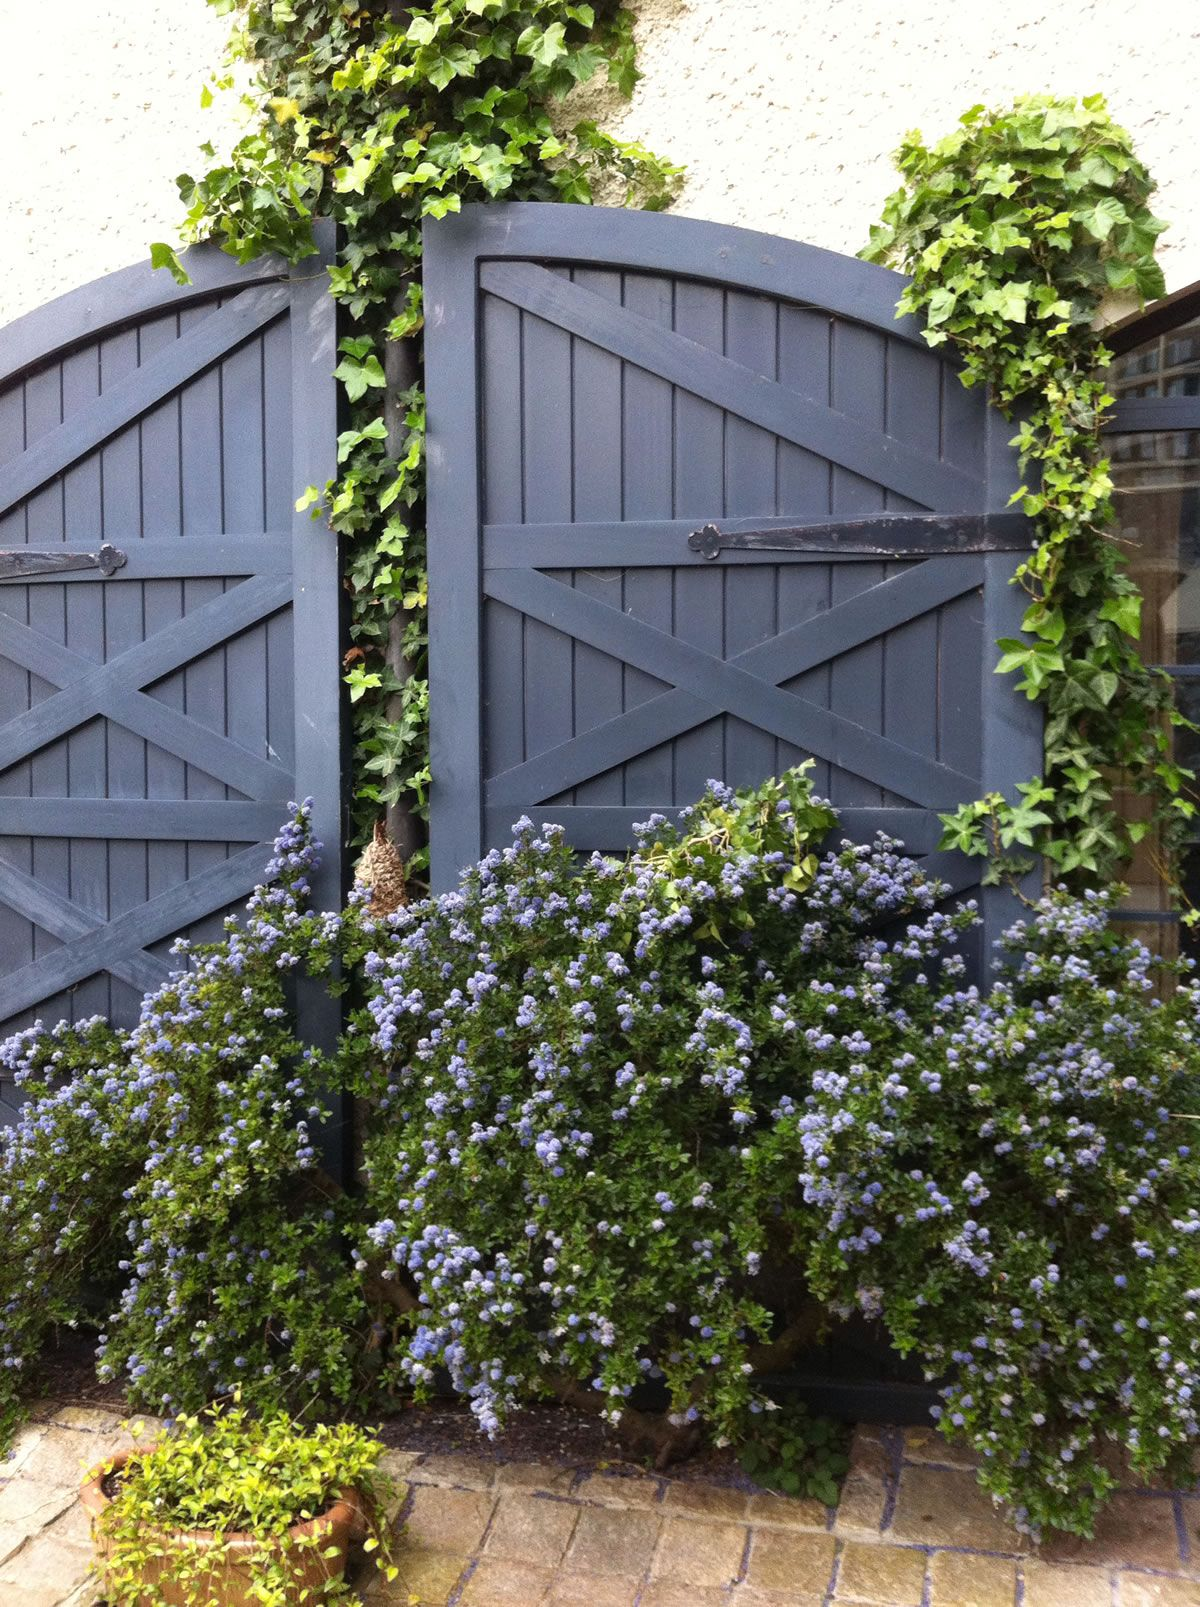 I Love This Garden With Shades Of Cuprinol Uk S Misty